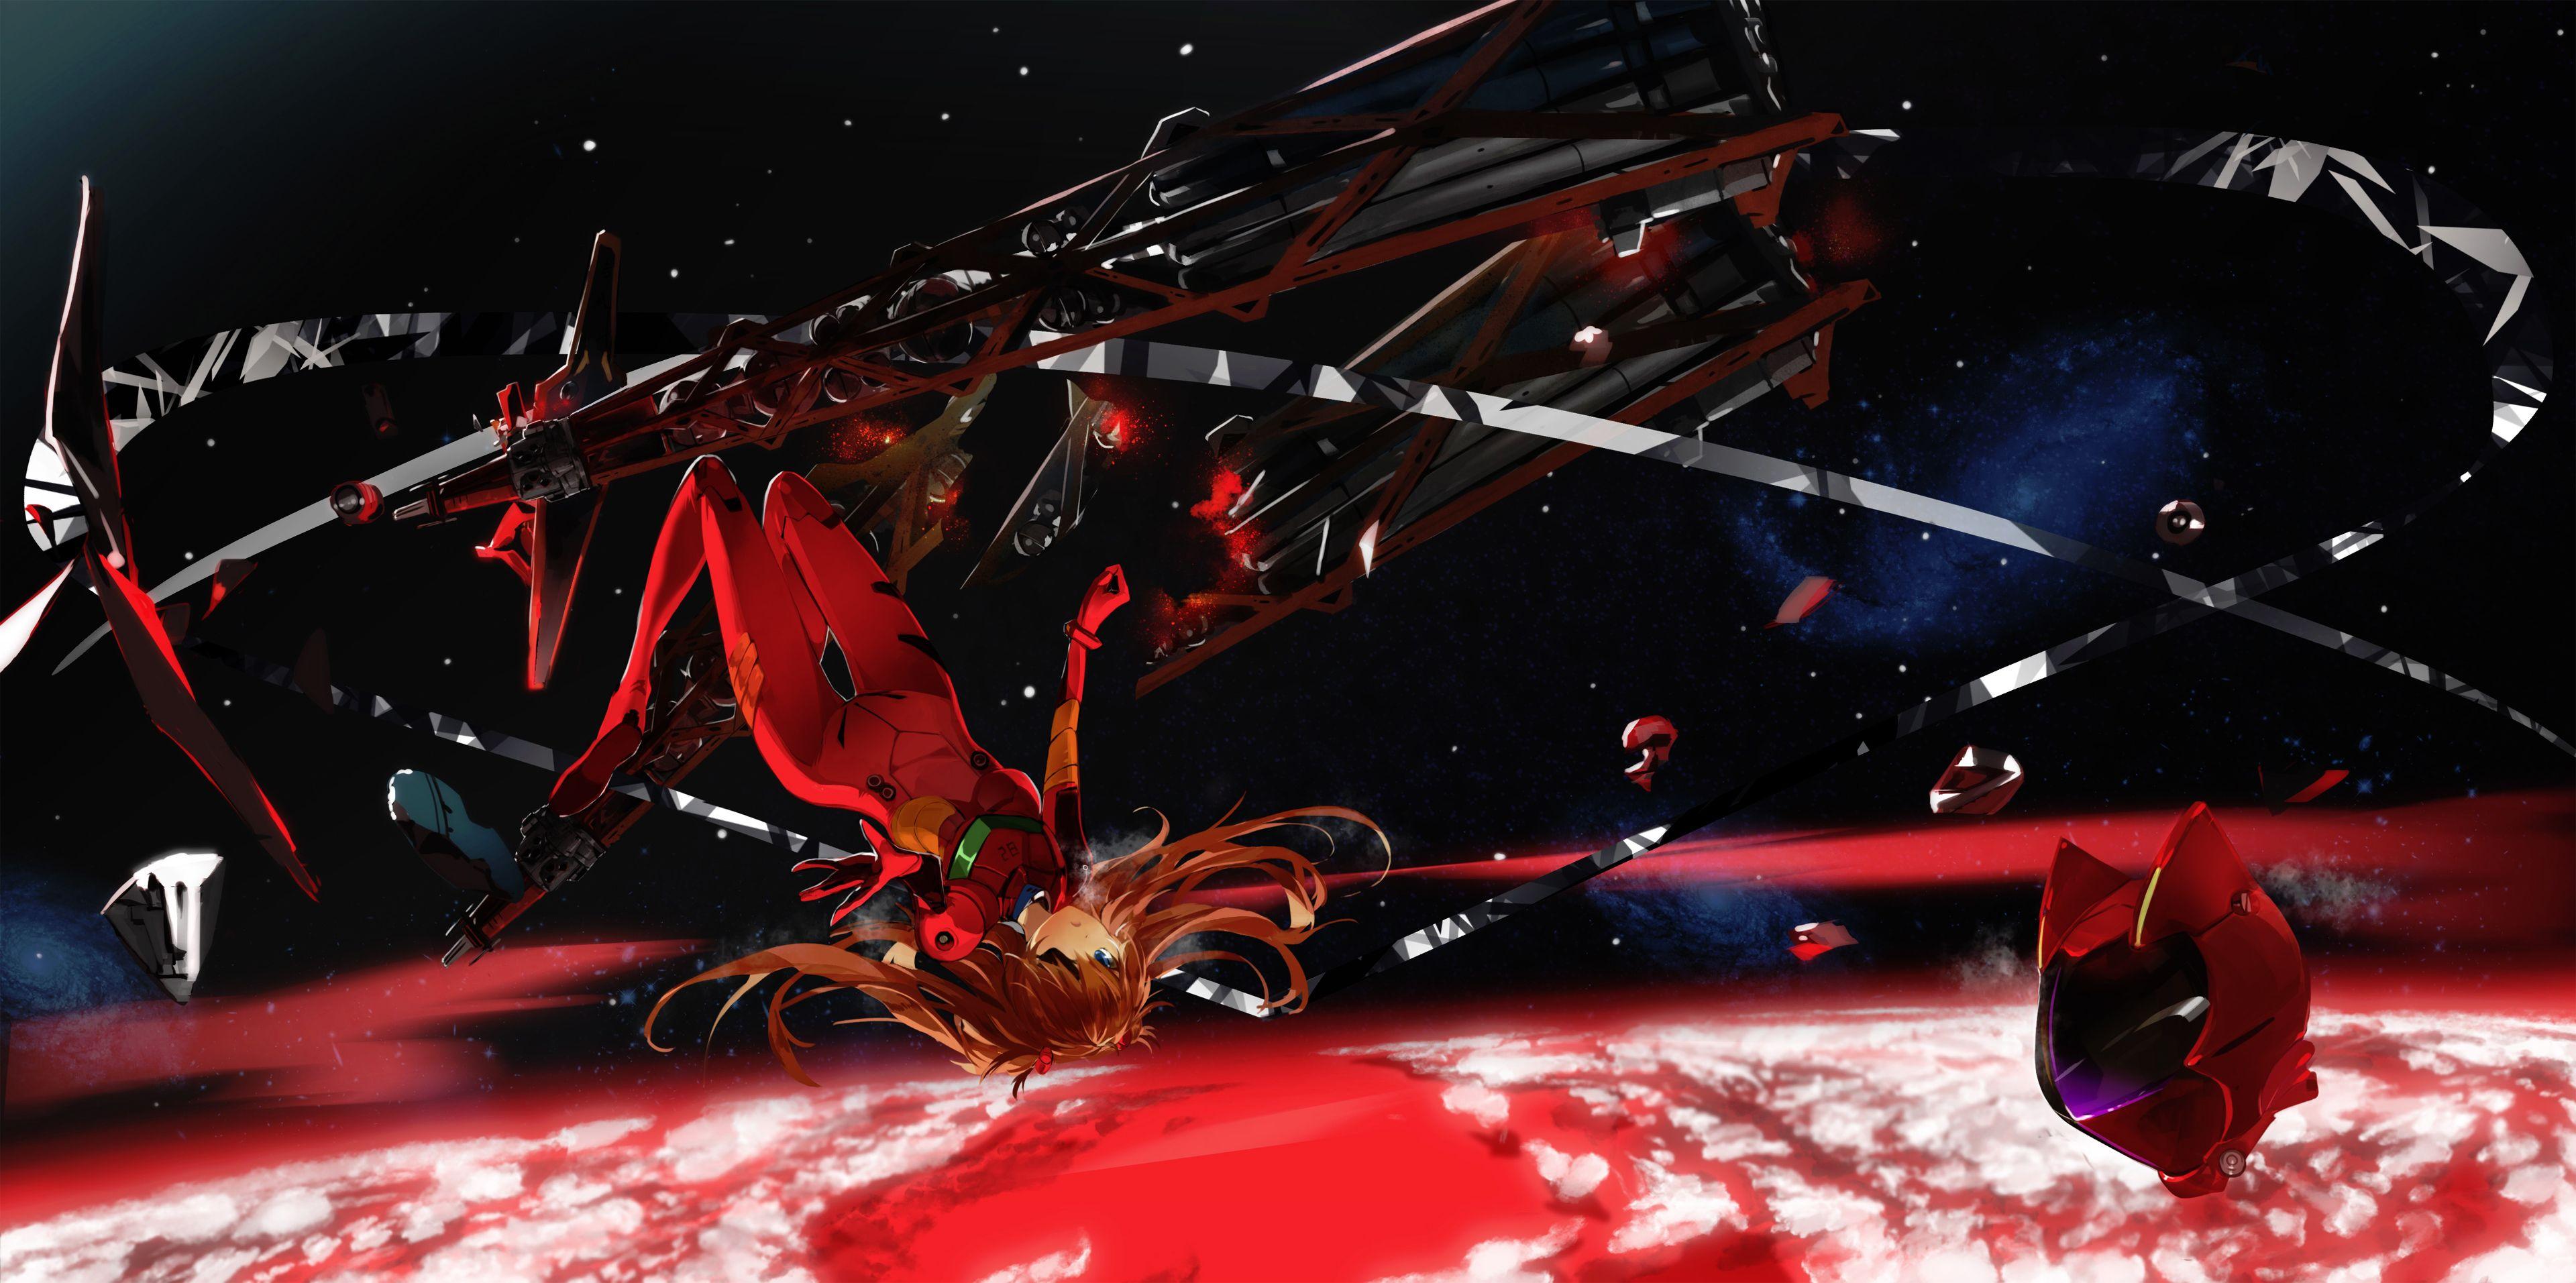 Neon Genesis Evangelion Asuka Langley Soryu Ayanami Rei Anime